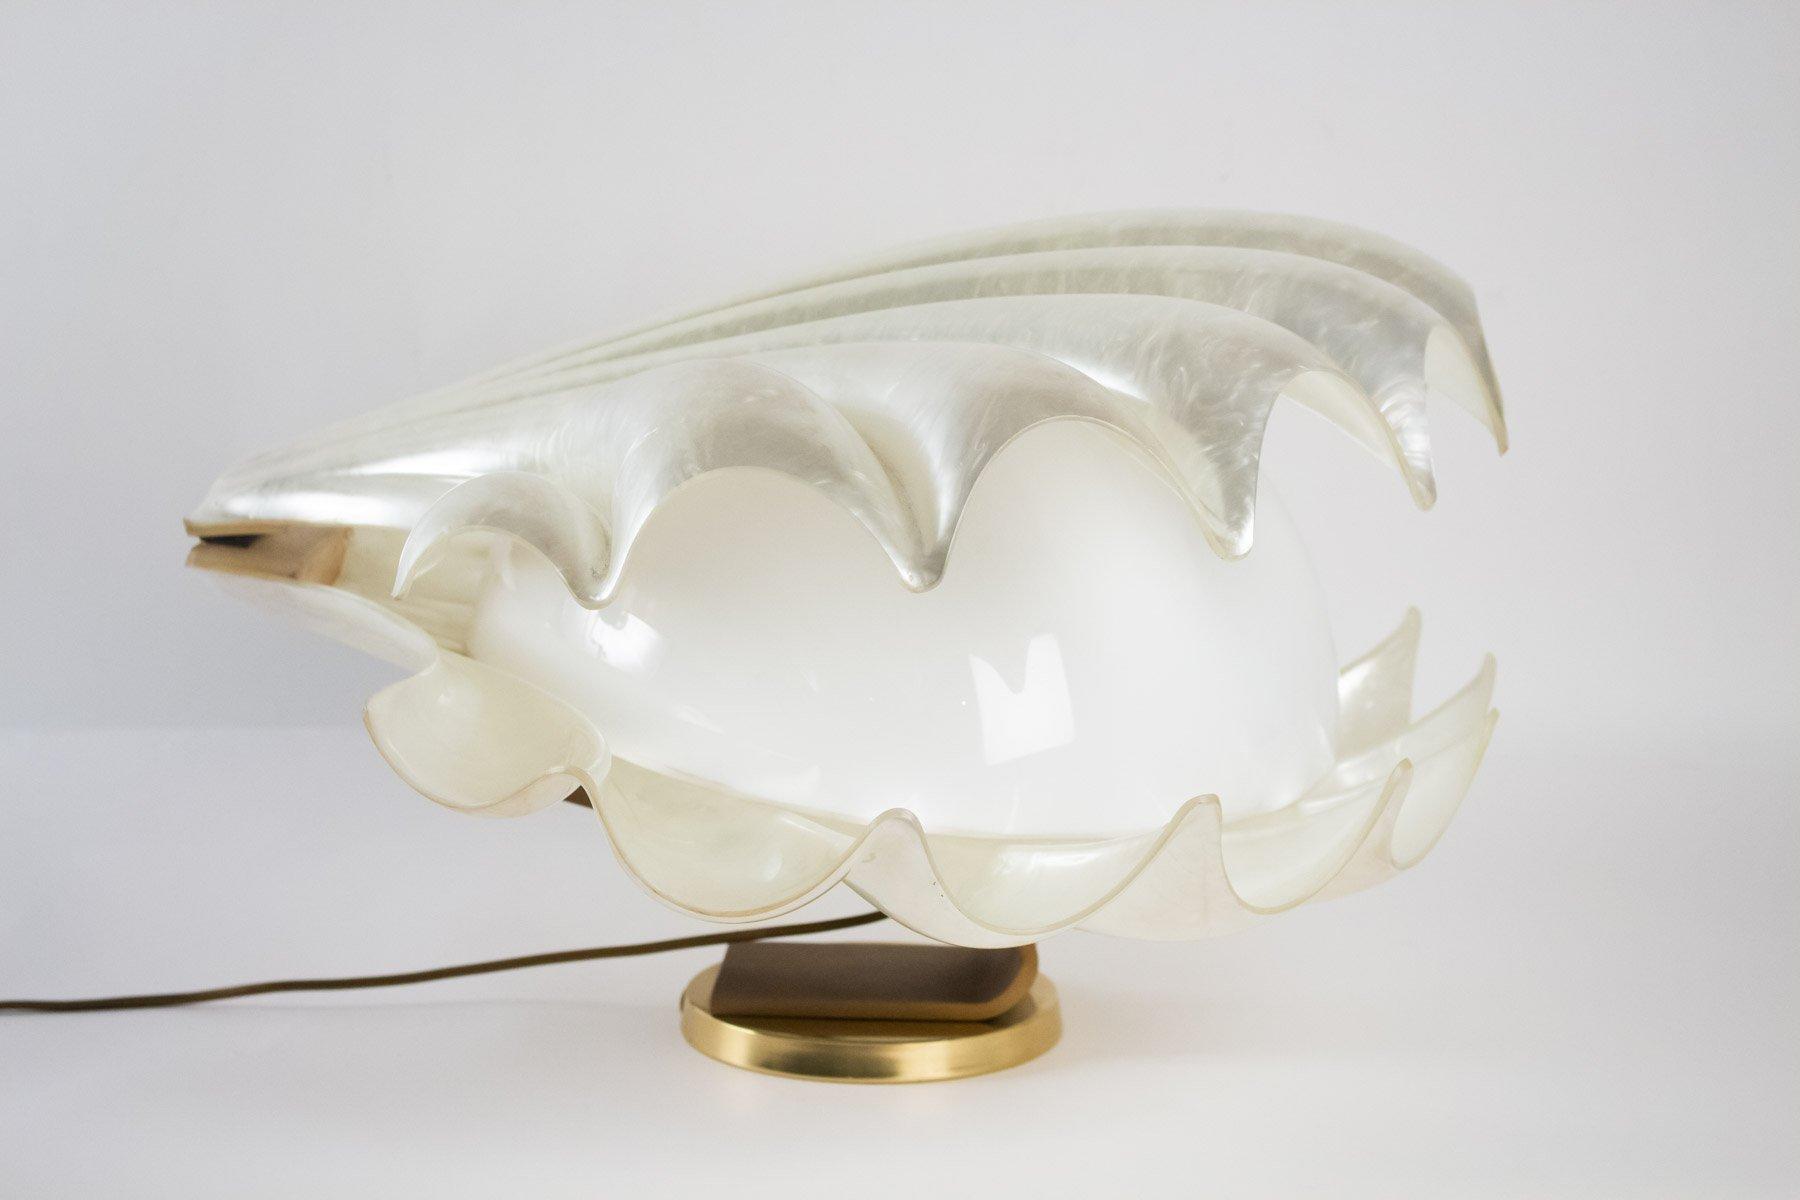 Lampe aus Plexiglas in Muschel-Optik, 1970er